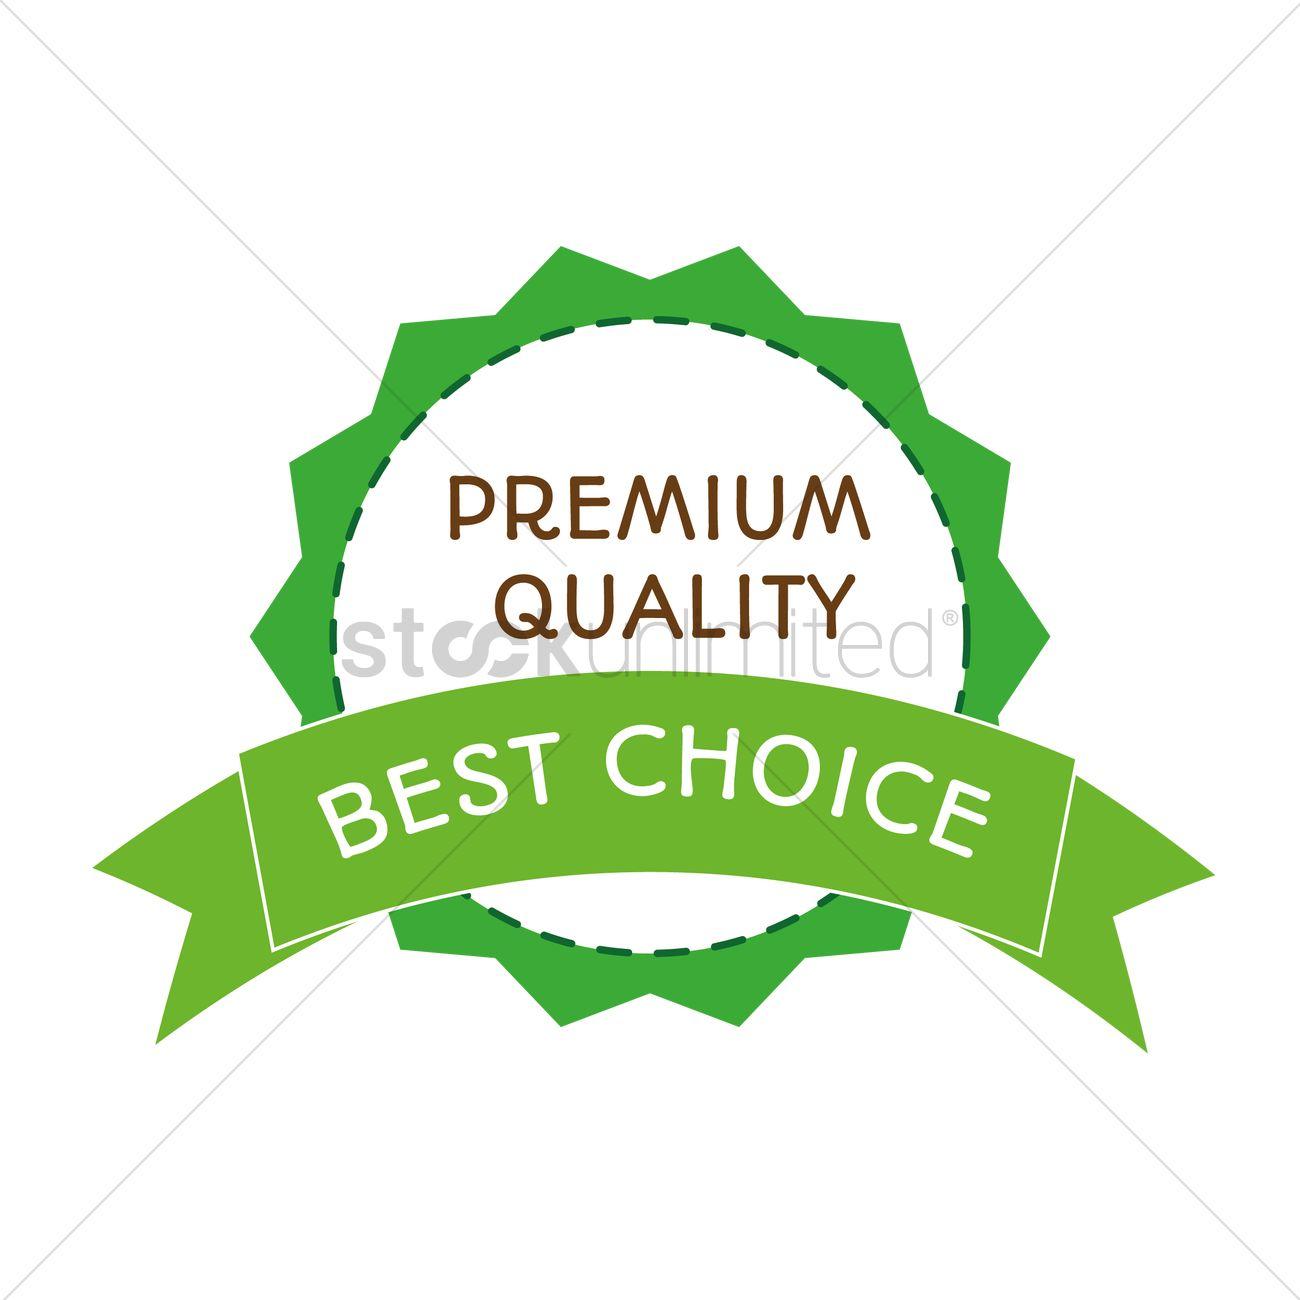 Jpeg ou clipart qual melhor clip art free Vintage premium quality badge Clipart Vetorizados - 1273598 ... clip art free